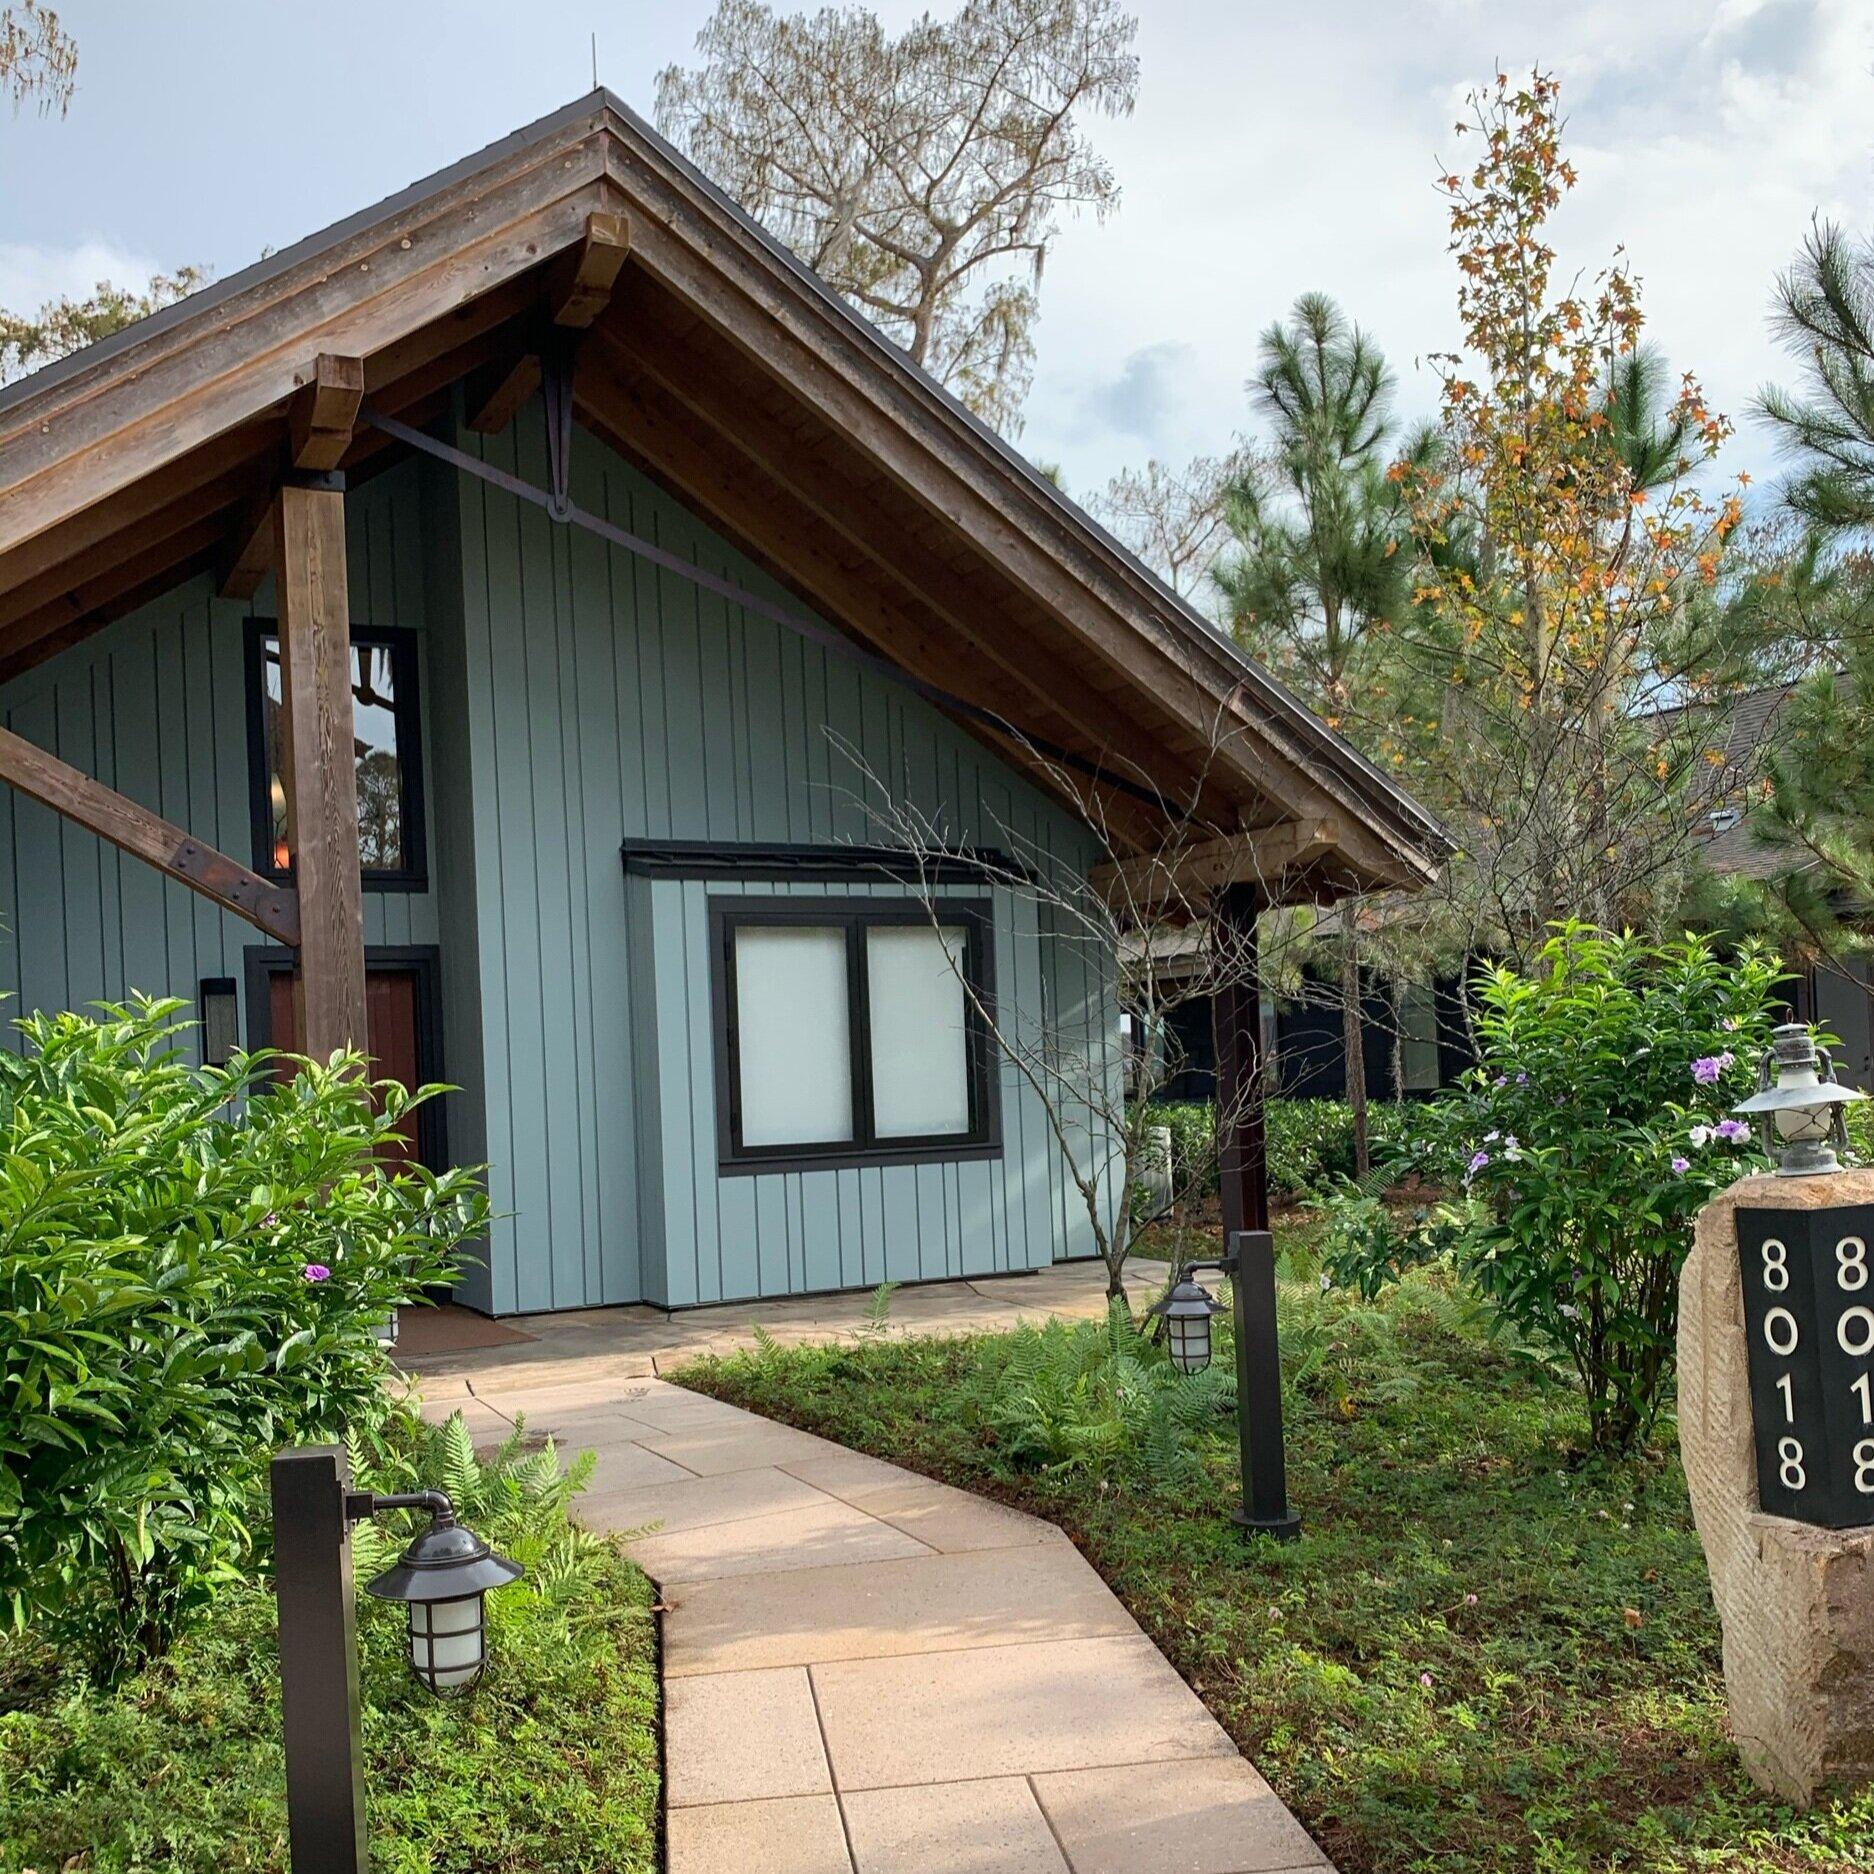 Cascade Cabin 8018 at Disney's Wilderness Lodge